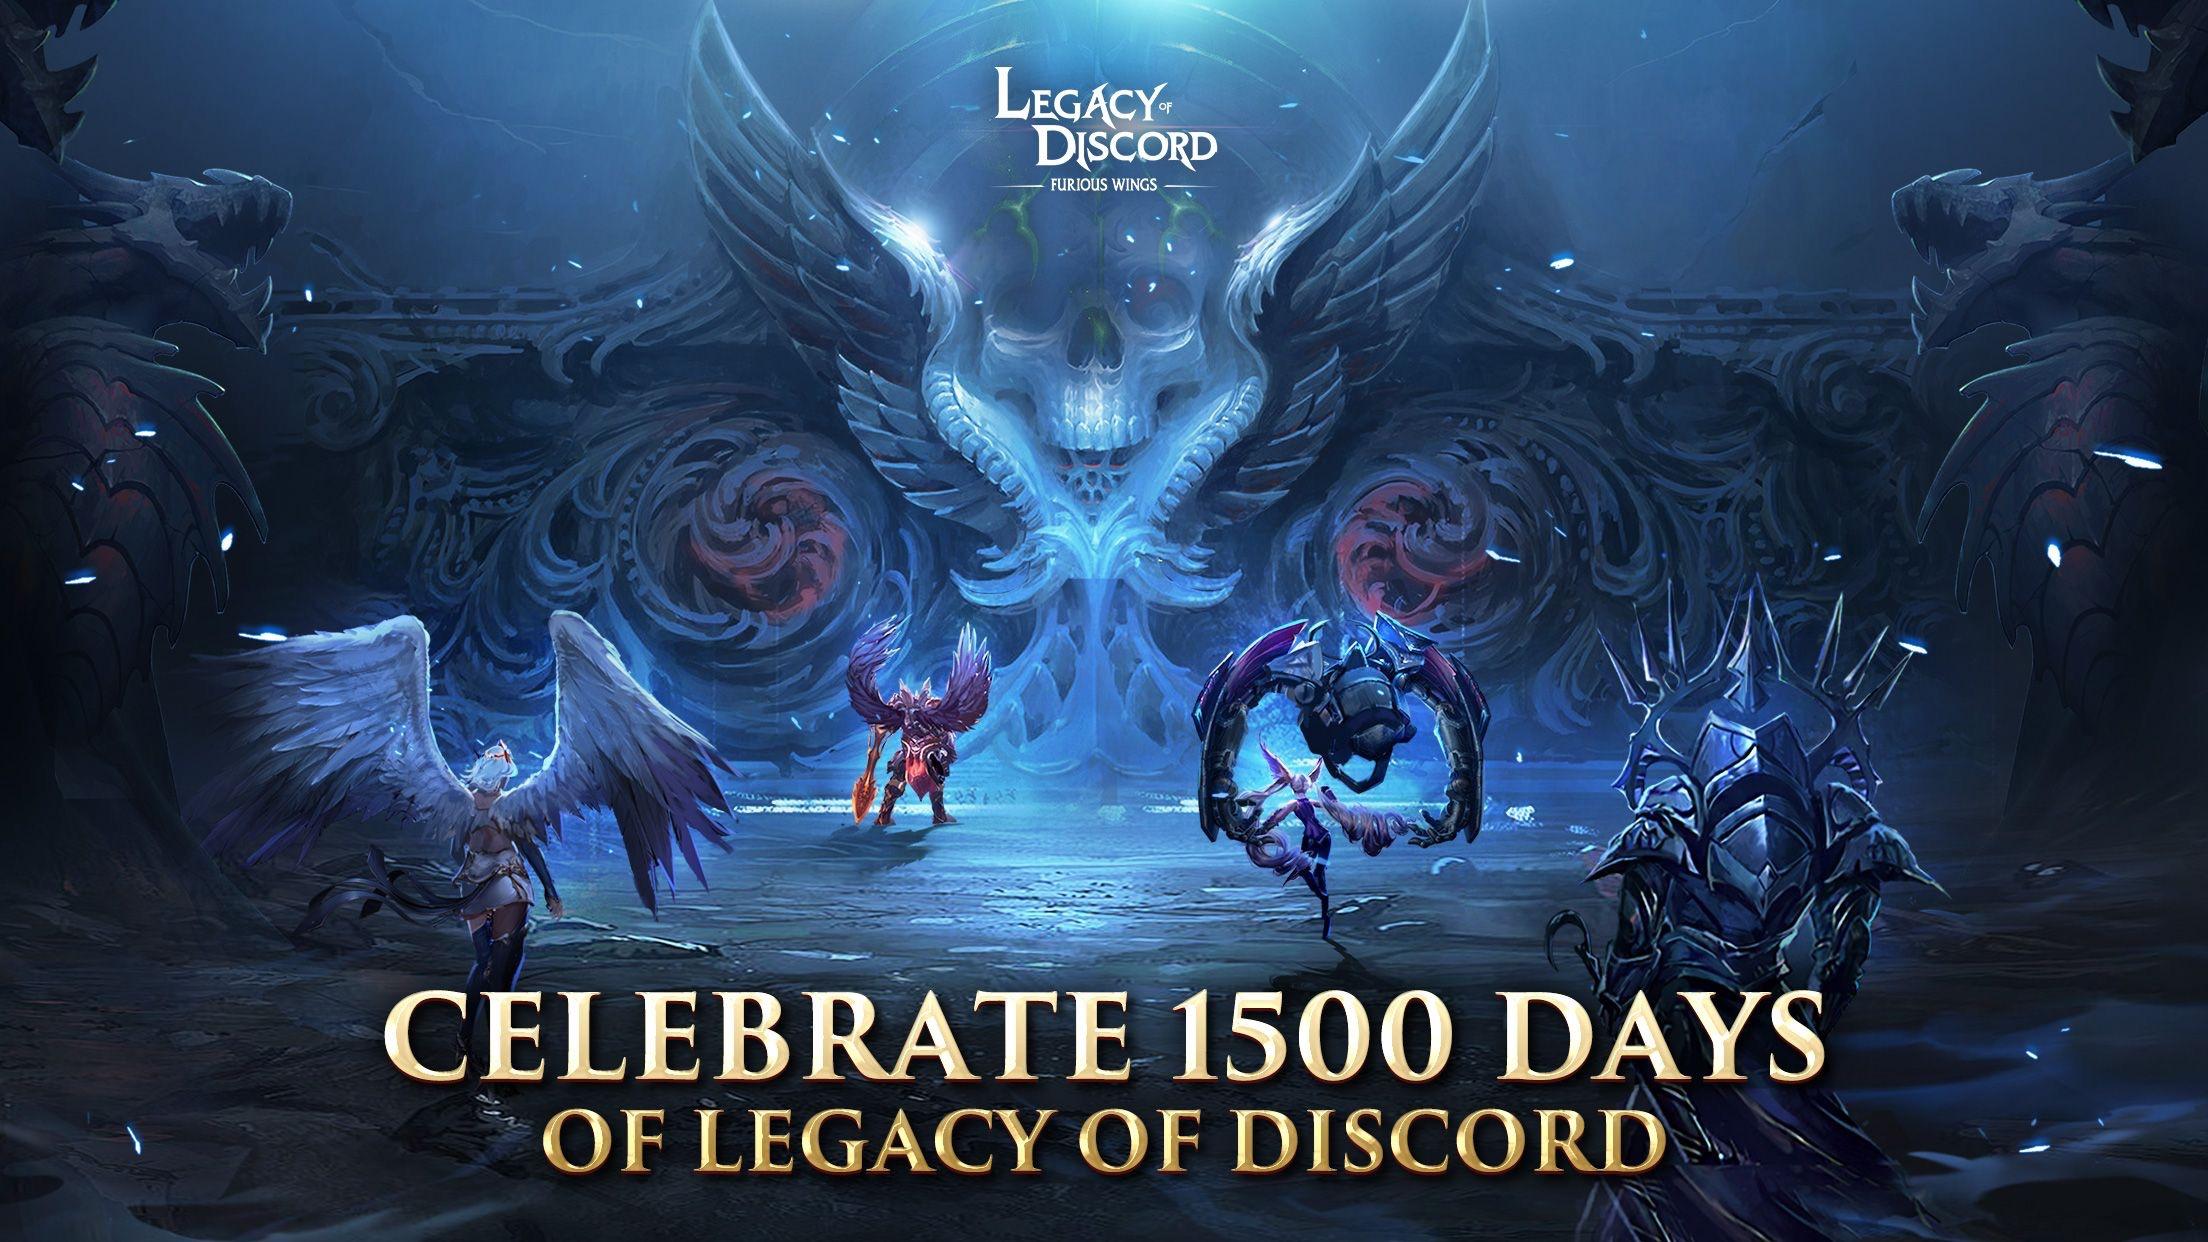 Legacy of Discord-FuriousWings Screenshot